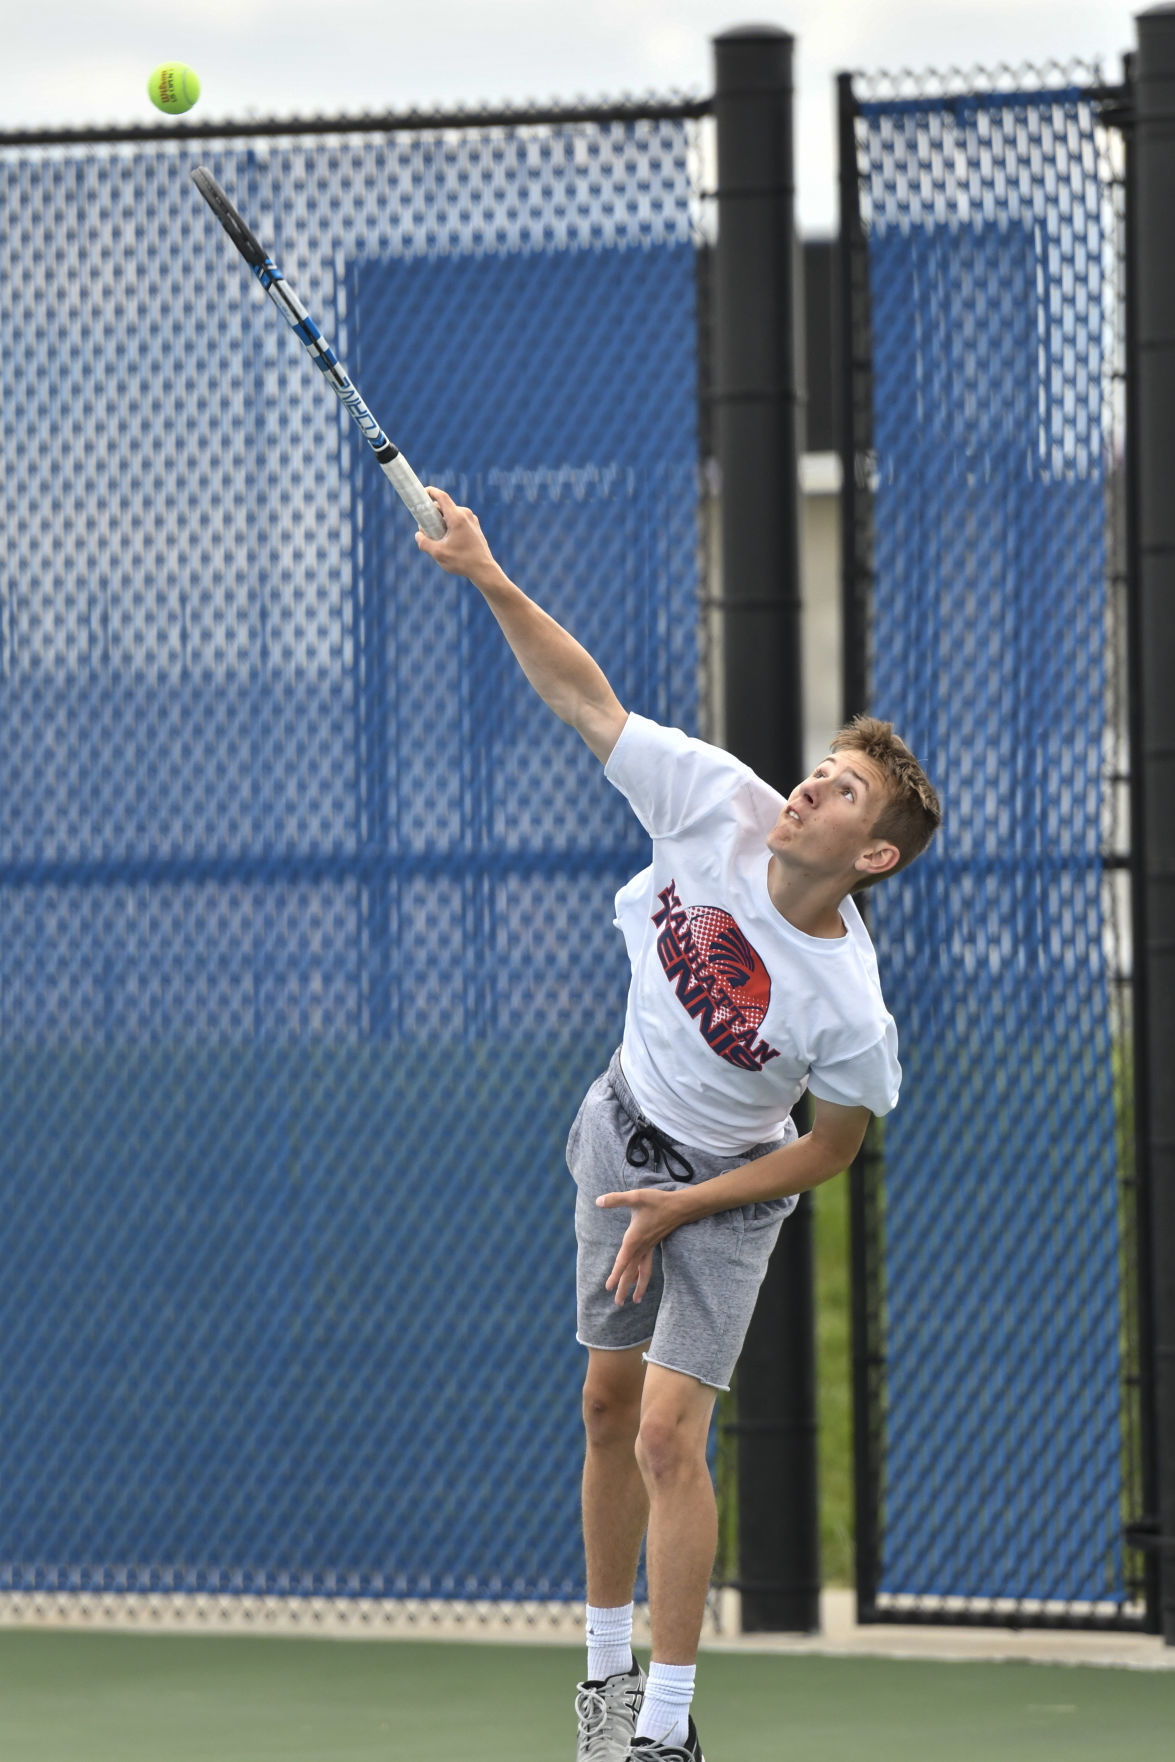 6A State Tennis Championship in Olathe: Manhattan High Boys Tennis